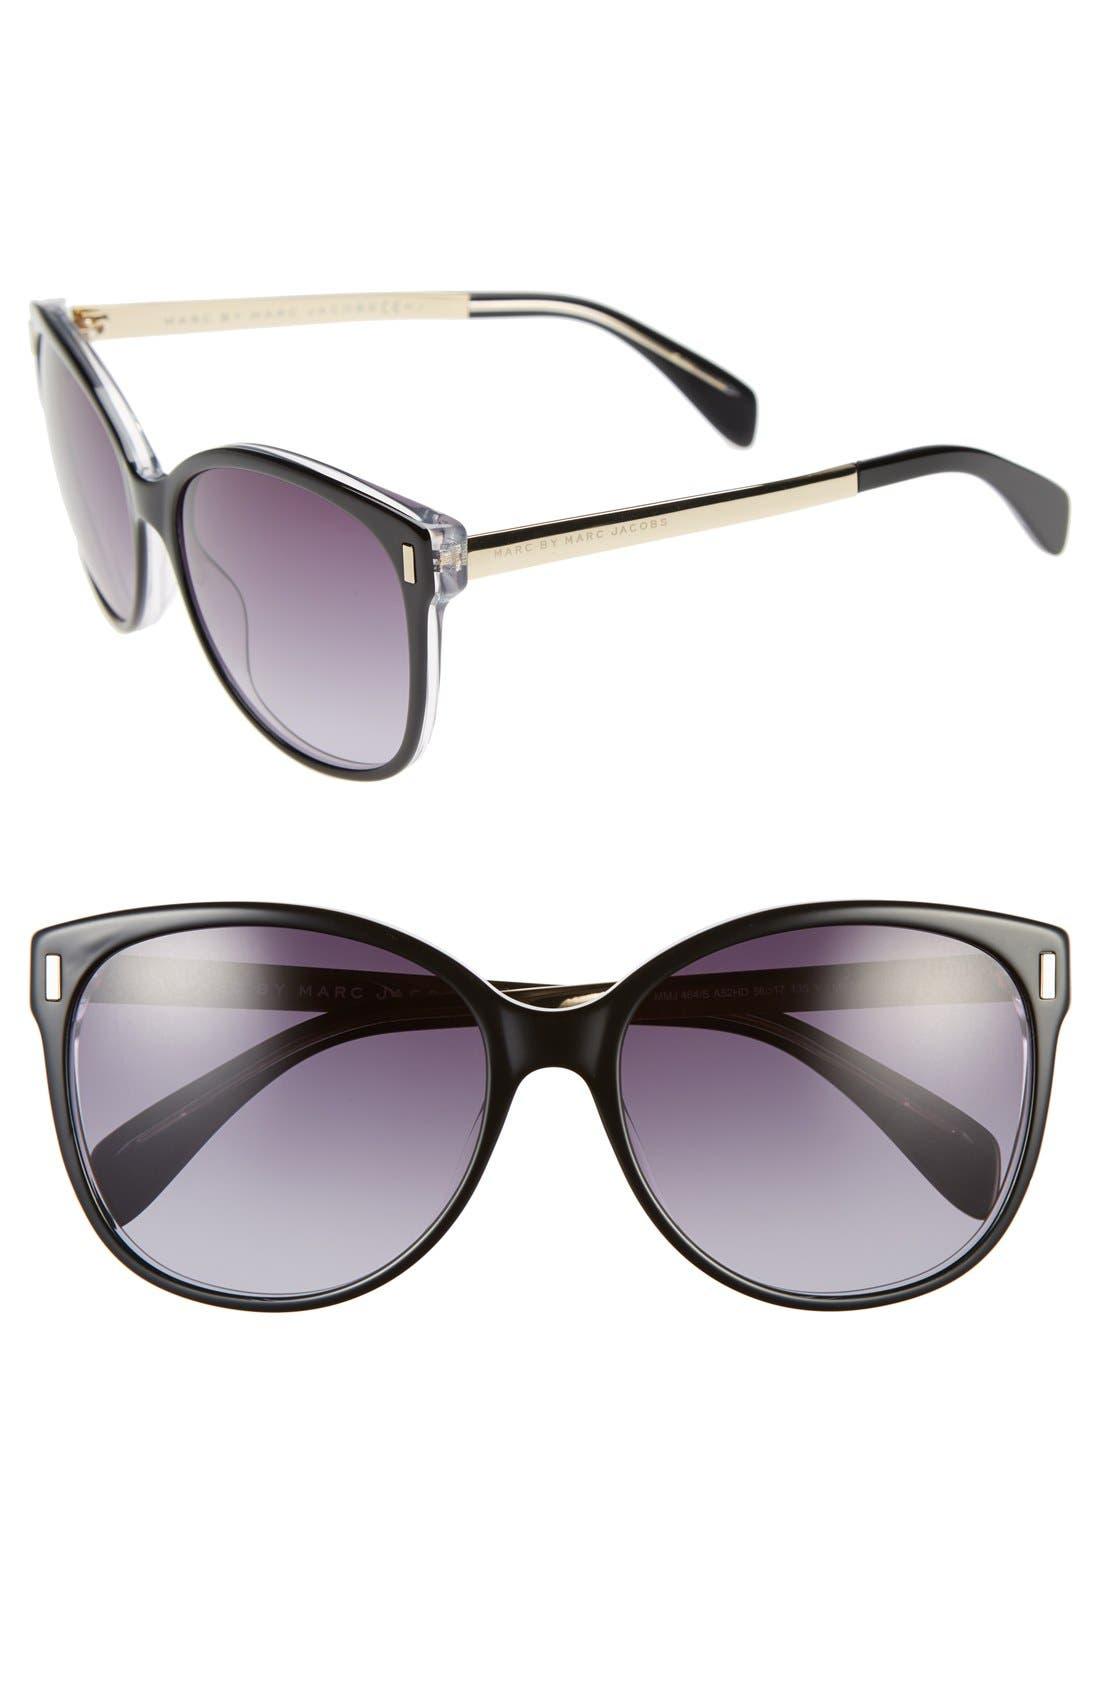 MARC BY MARC JACOBS 56mm Retro Sunglasses, Main, color, 001